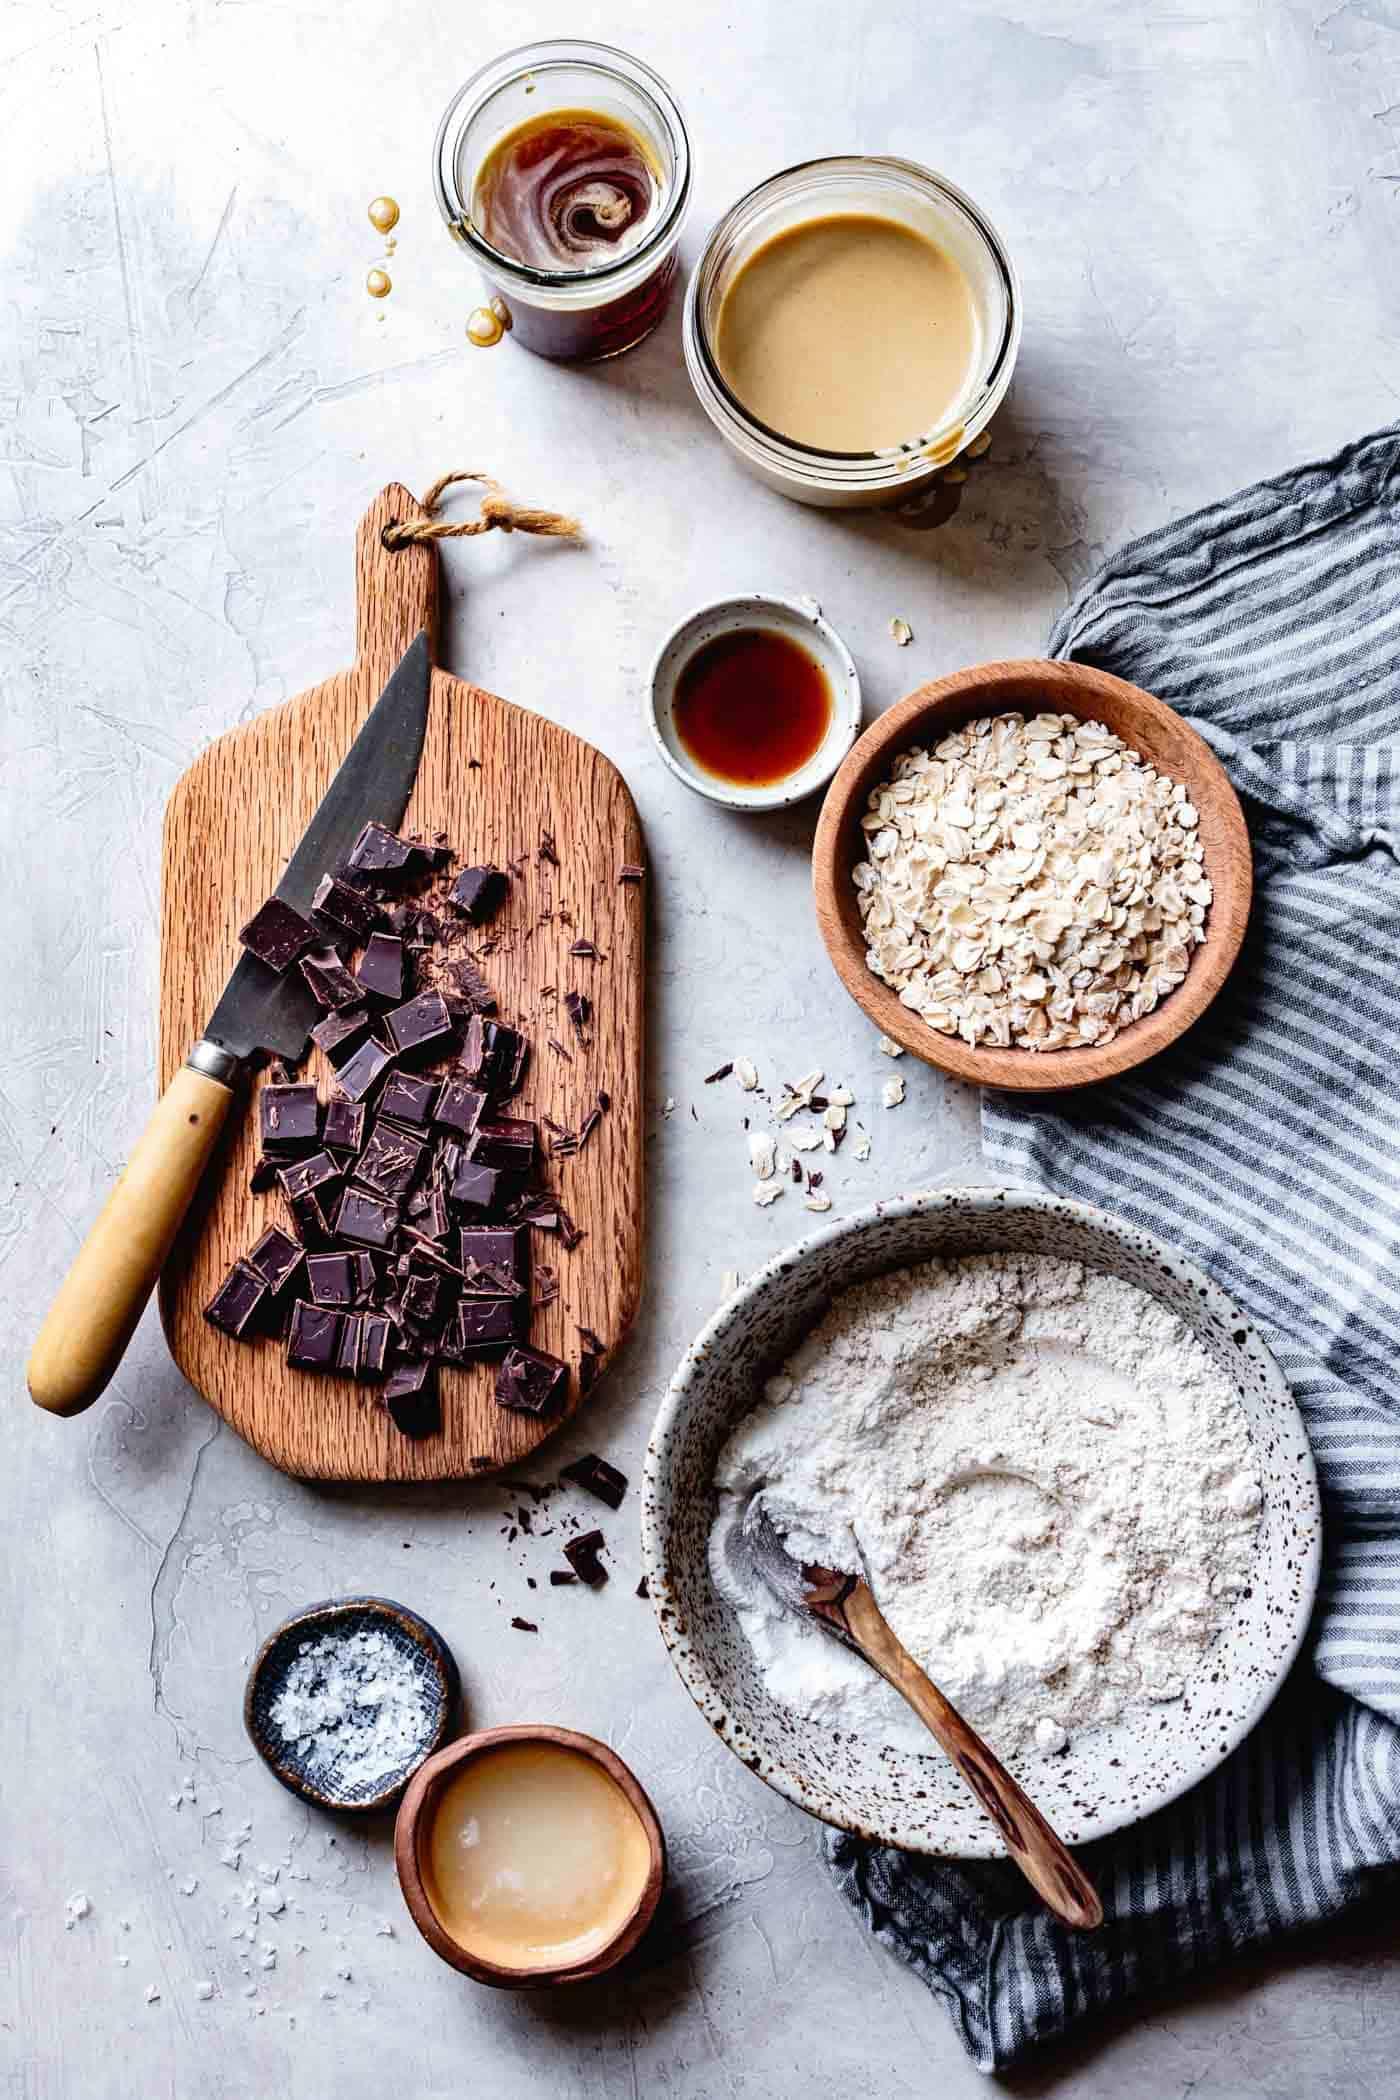 Ingredients for healthy vegan gluten-free oatmeal chocolate chip cookies